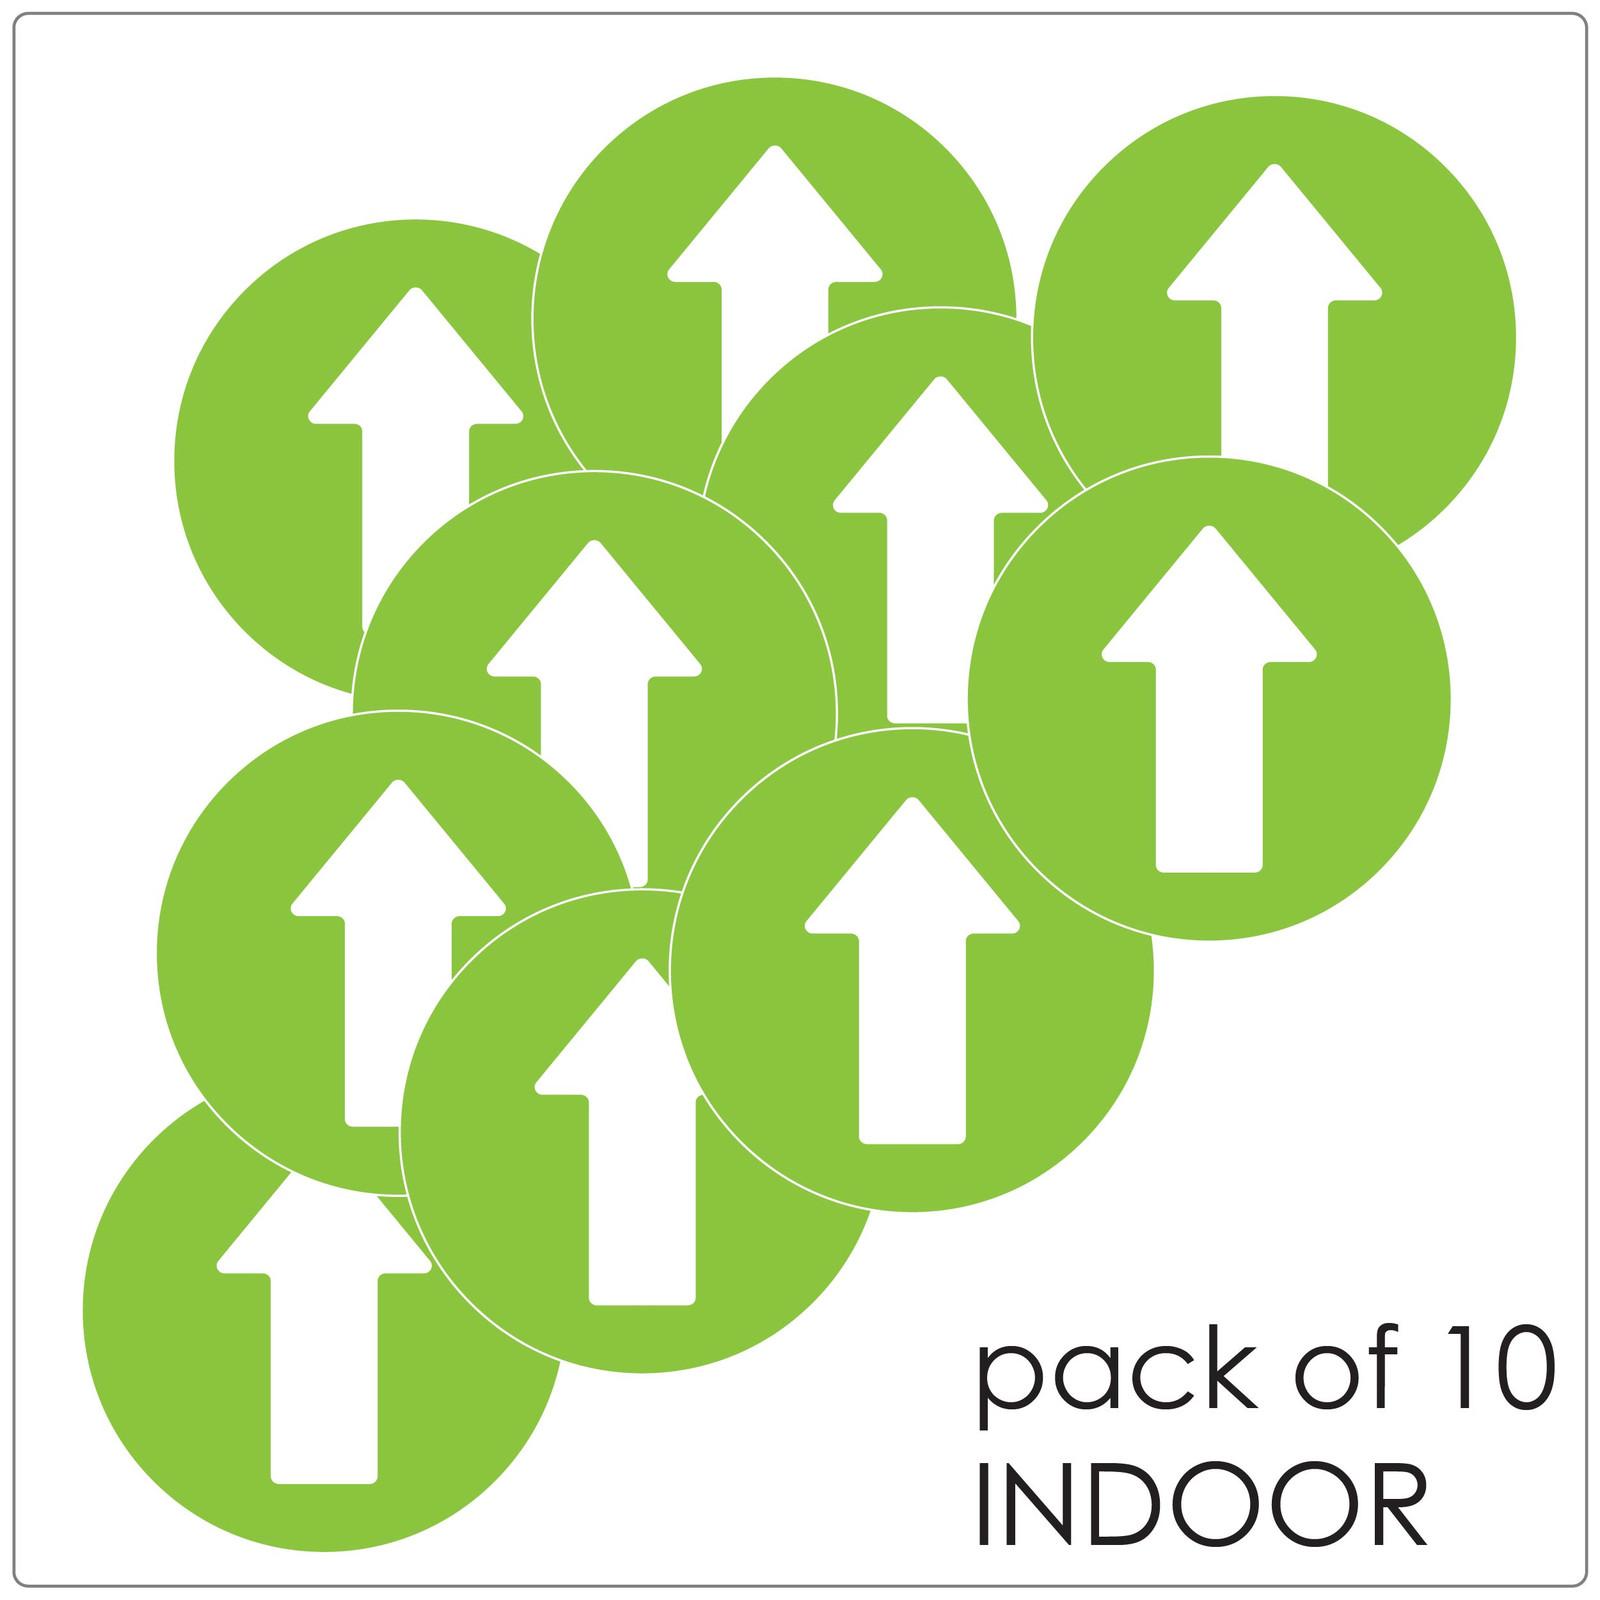 directional arrow social distancing floor sticker for hard floors, pack of 10, green Self-adhesive Corona virus floor sticker to help with traffic flow